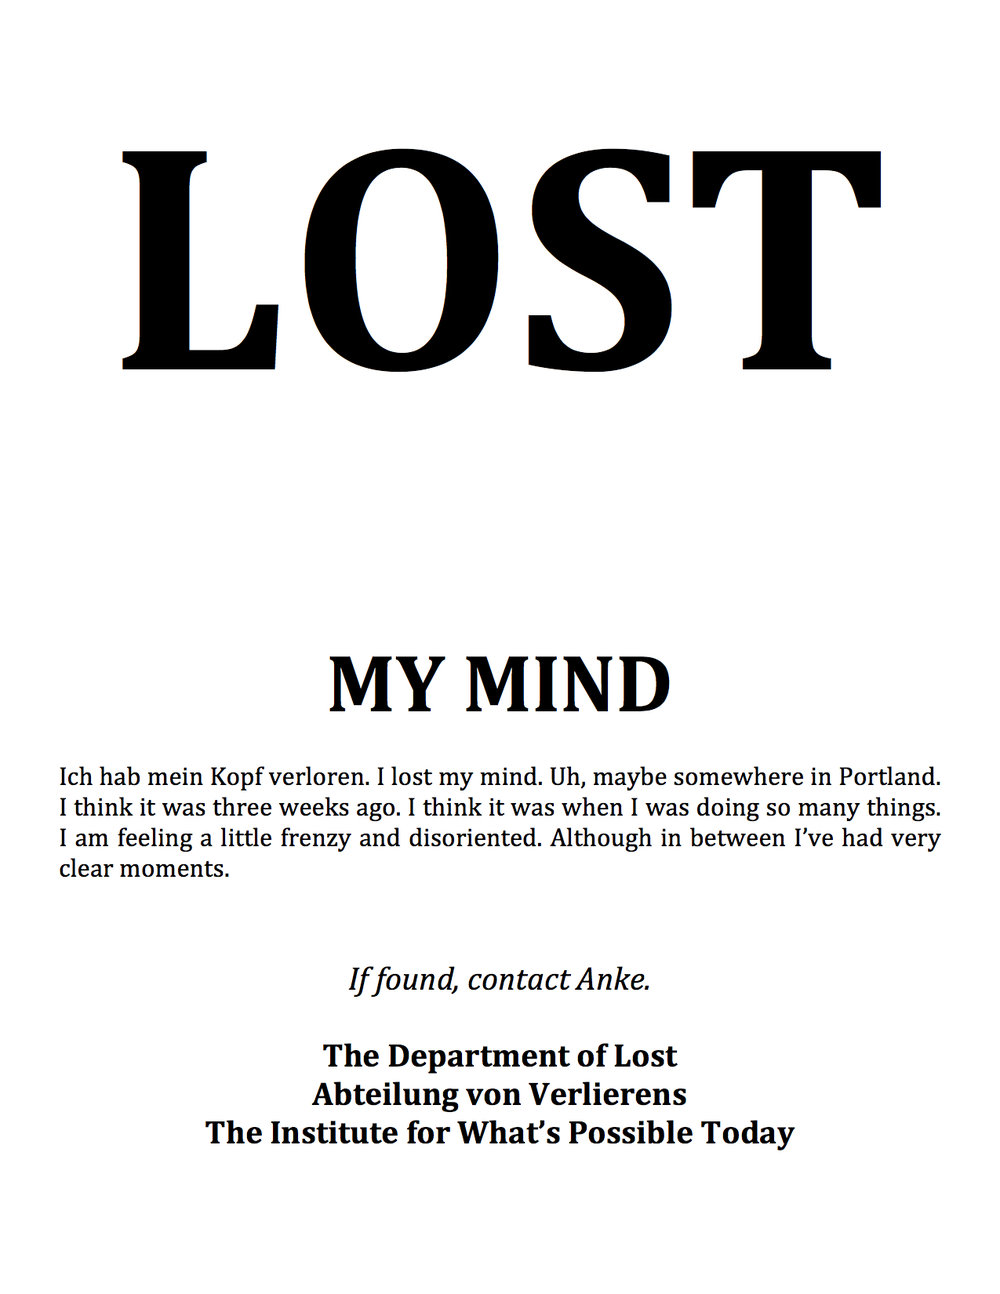 LOST my mind jpeg.jpg